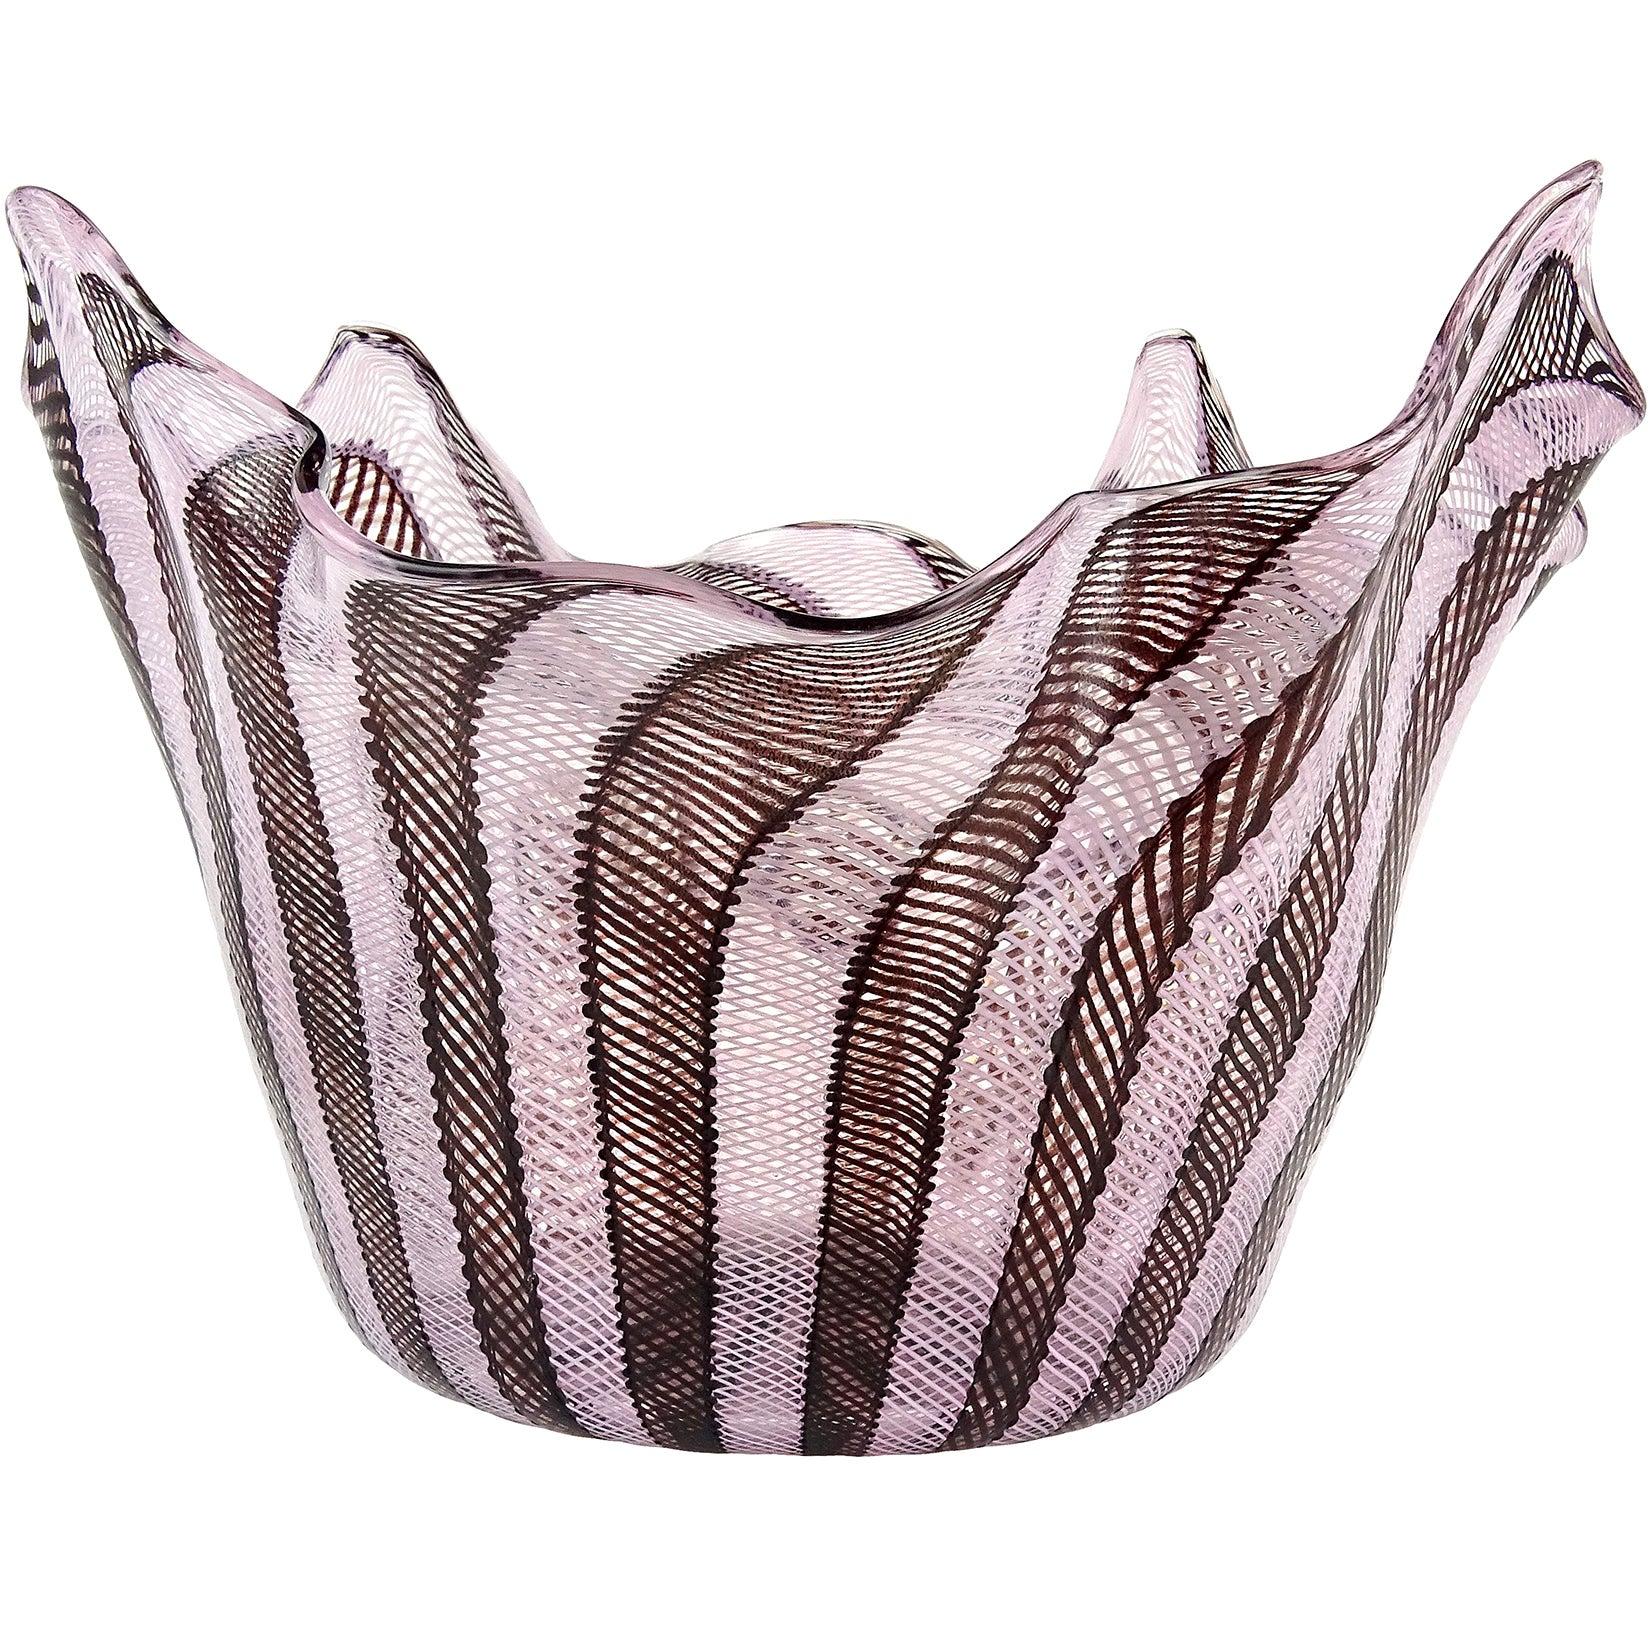 Fratelli Toso Murano Pink Black Ribbons Large Italian Art Glass Fazzoletto Vase